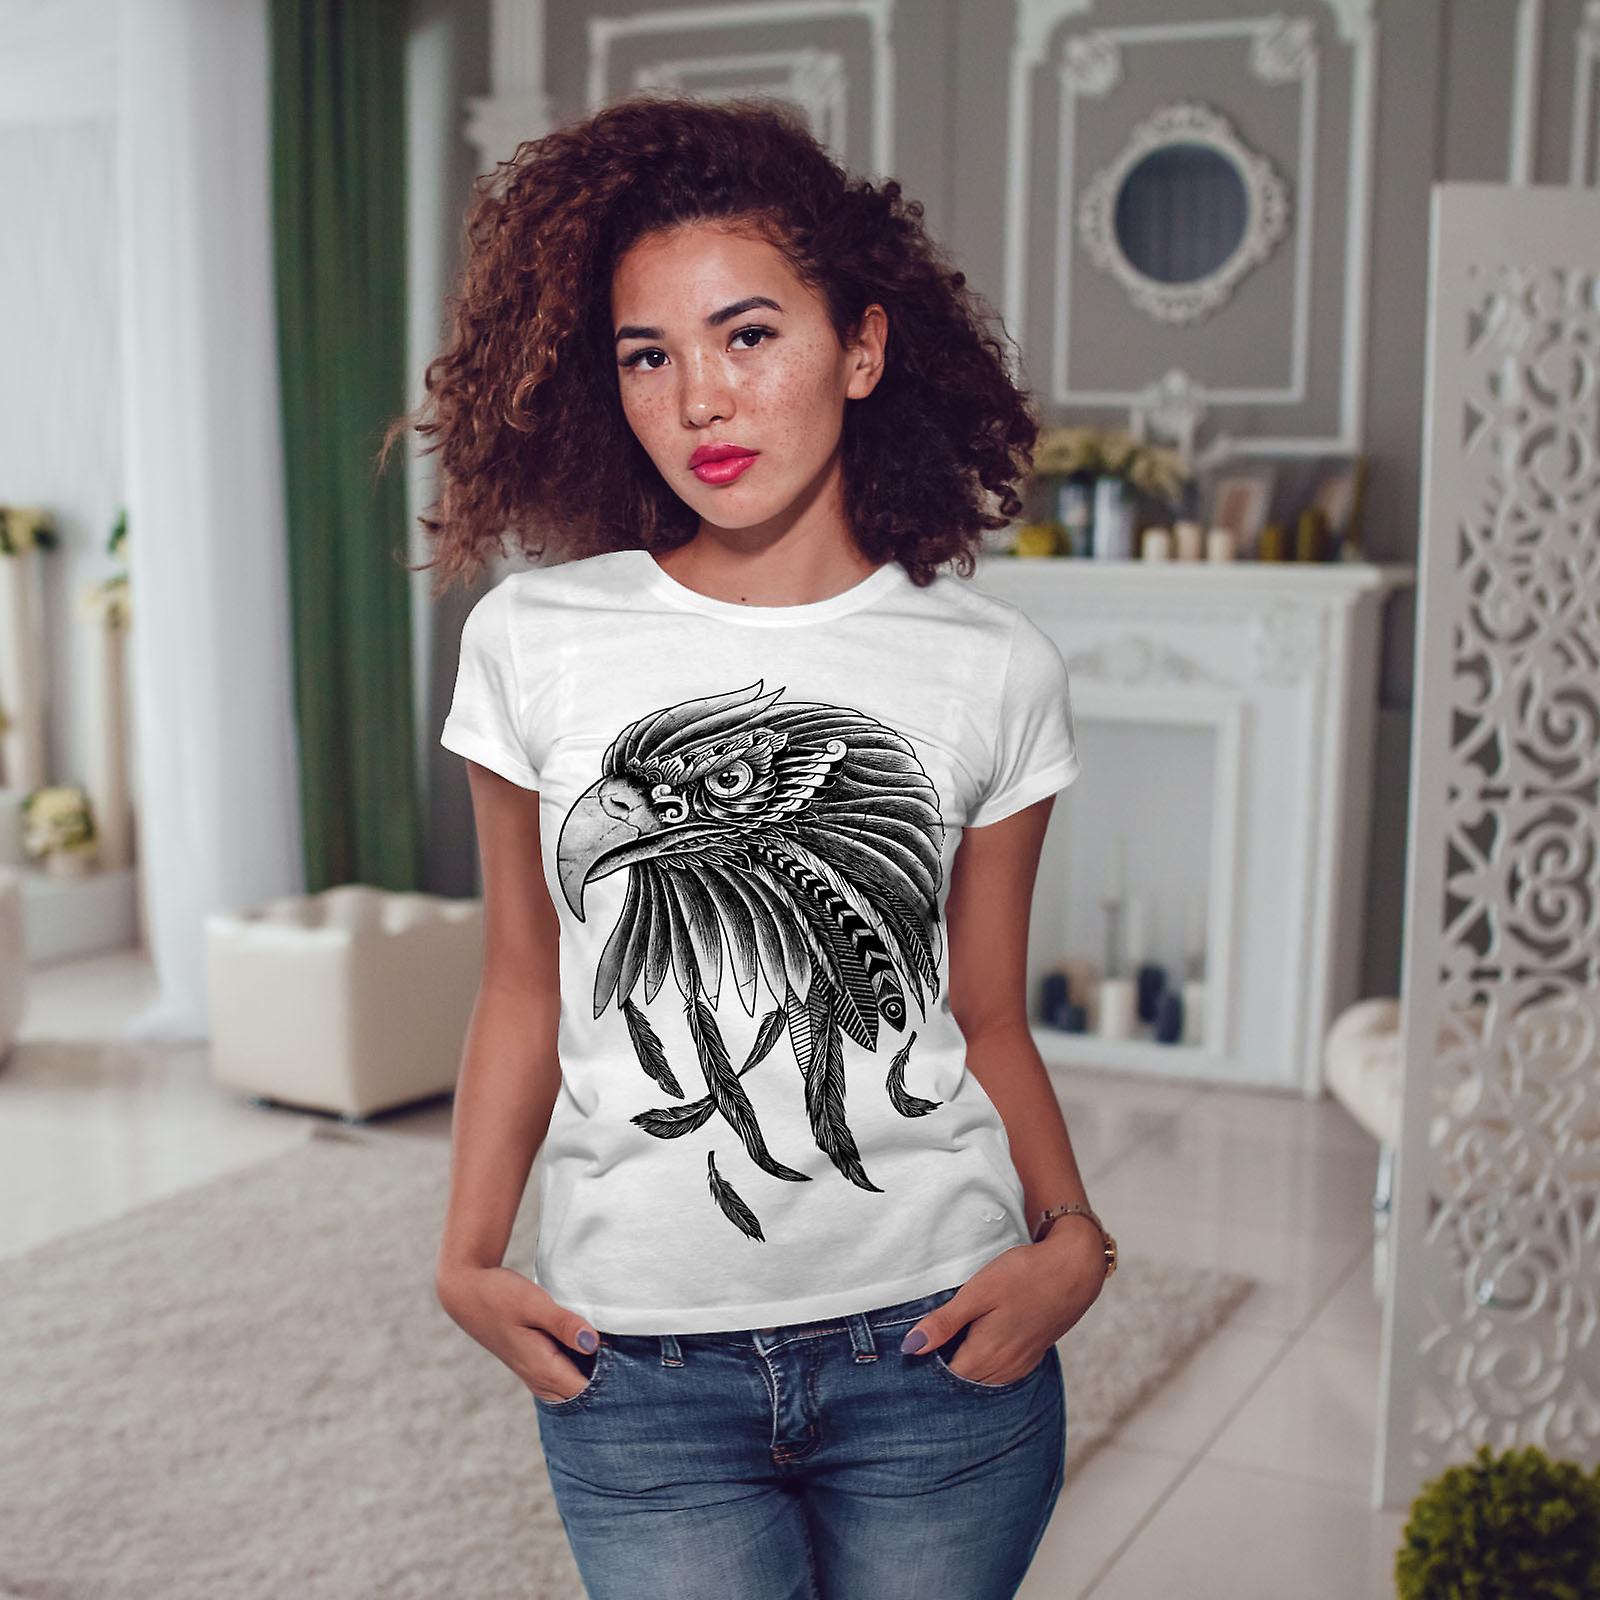 WhiteT-shirt de femme indienne Eagle   Wellcoda